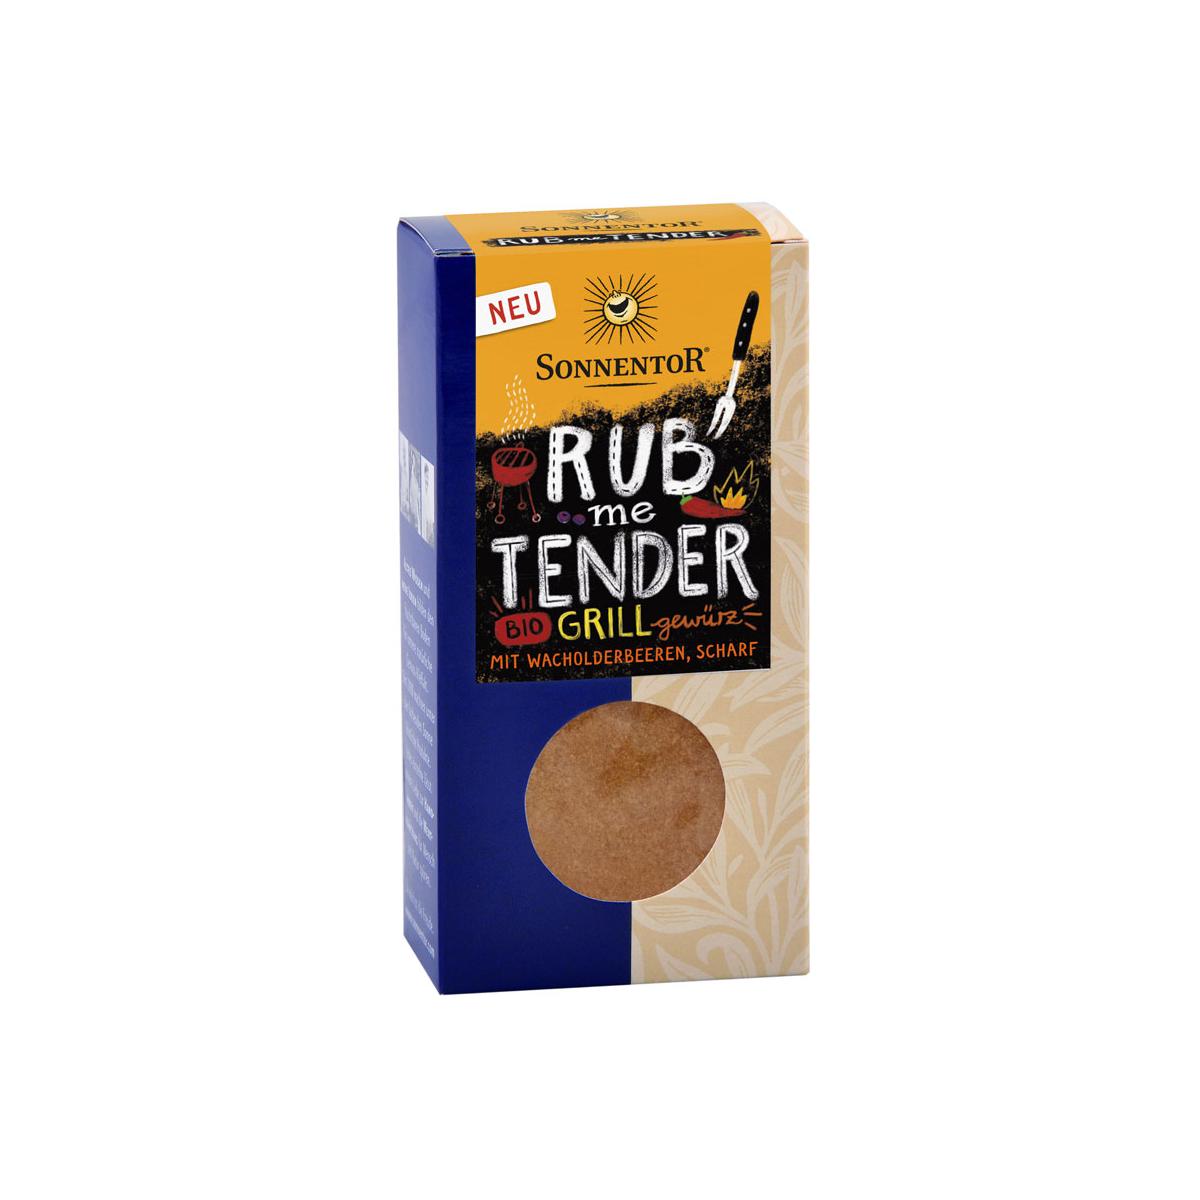 Rub me Tender Grillgewürz